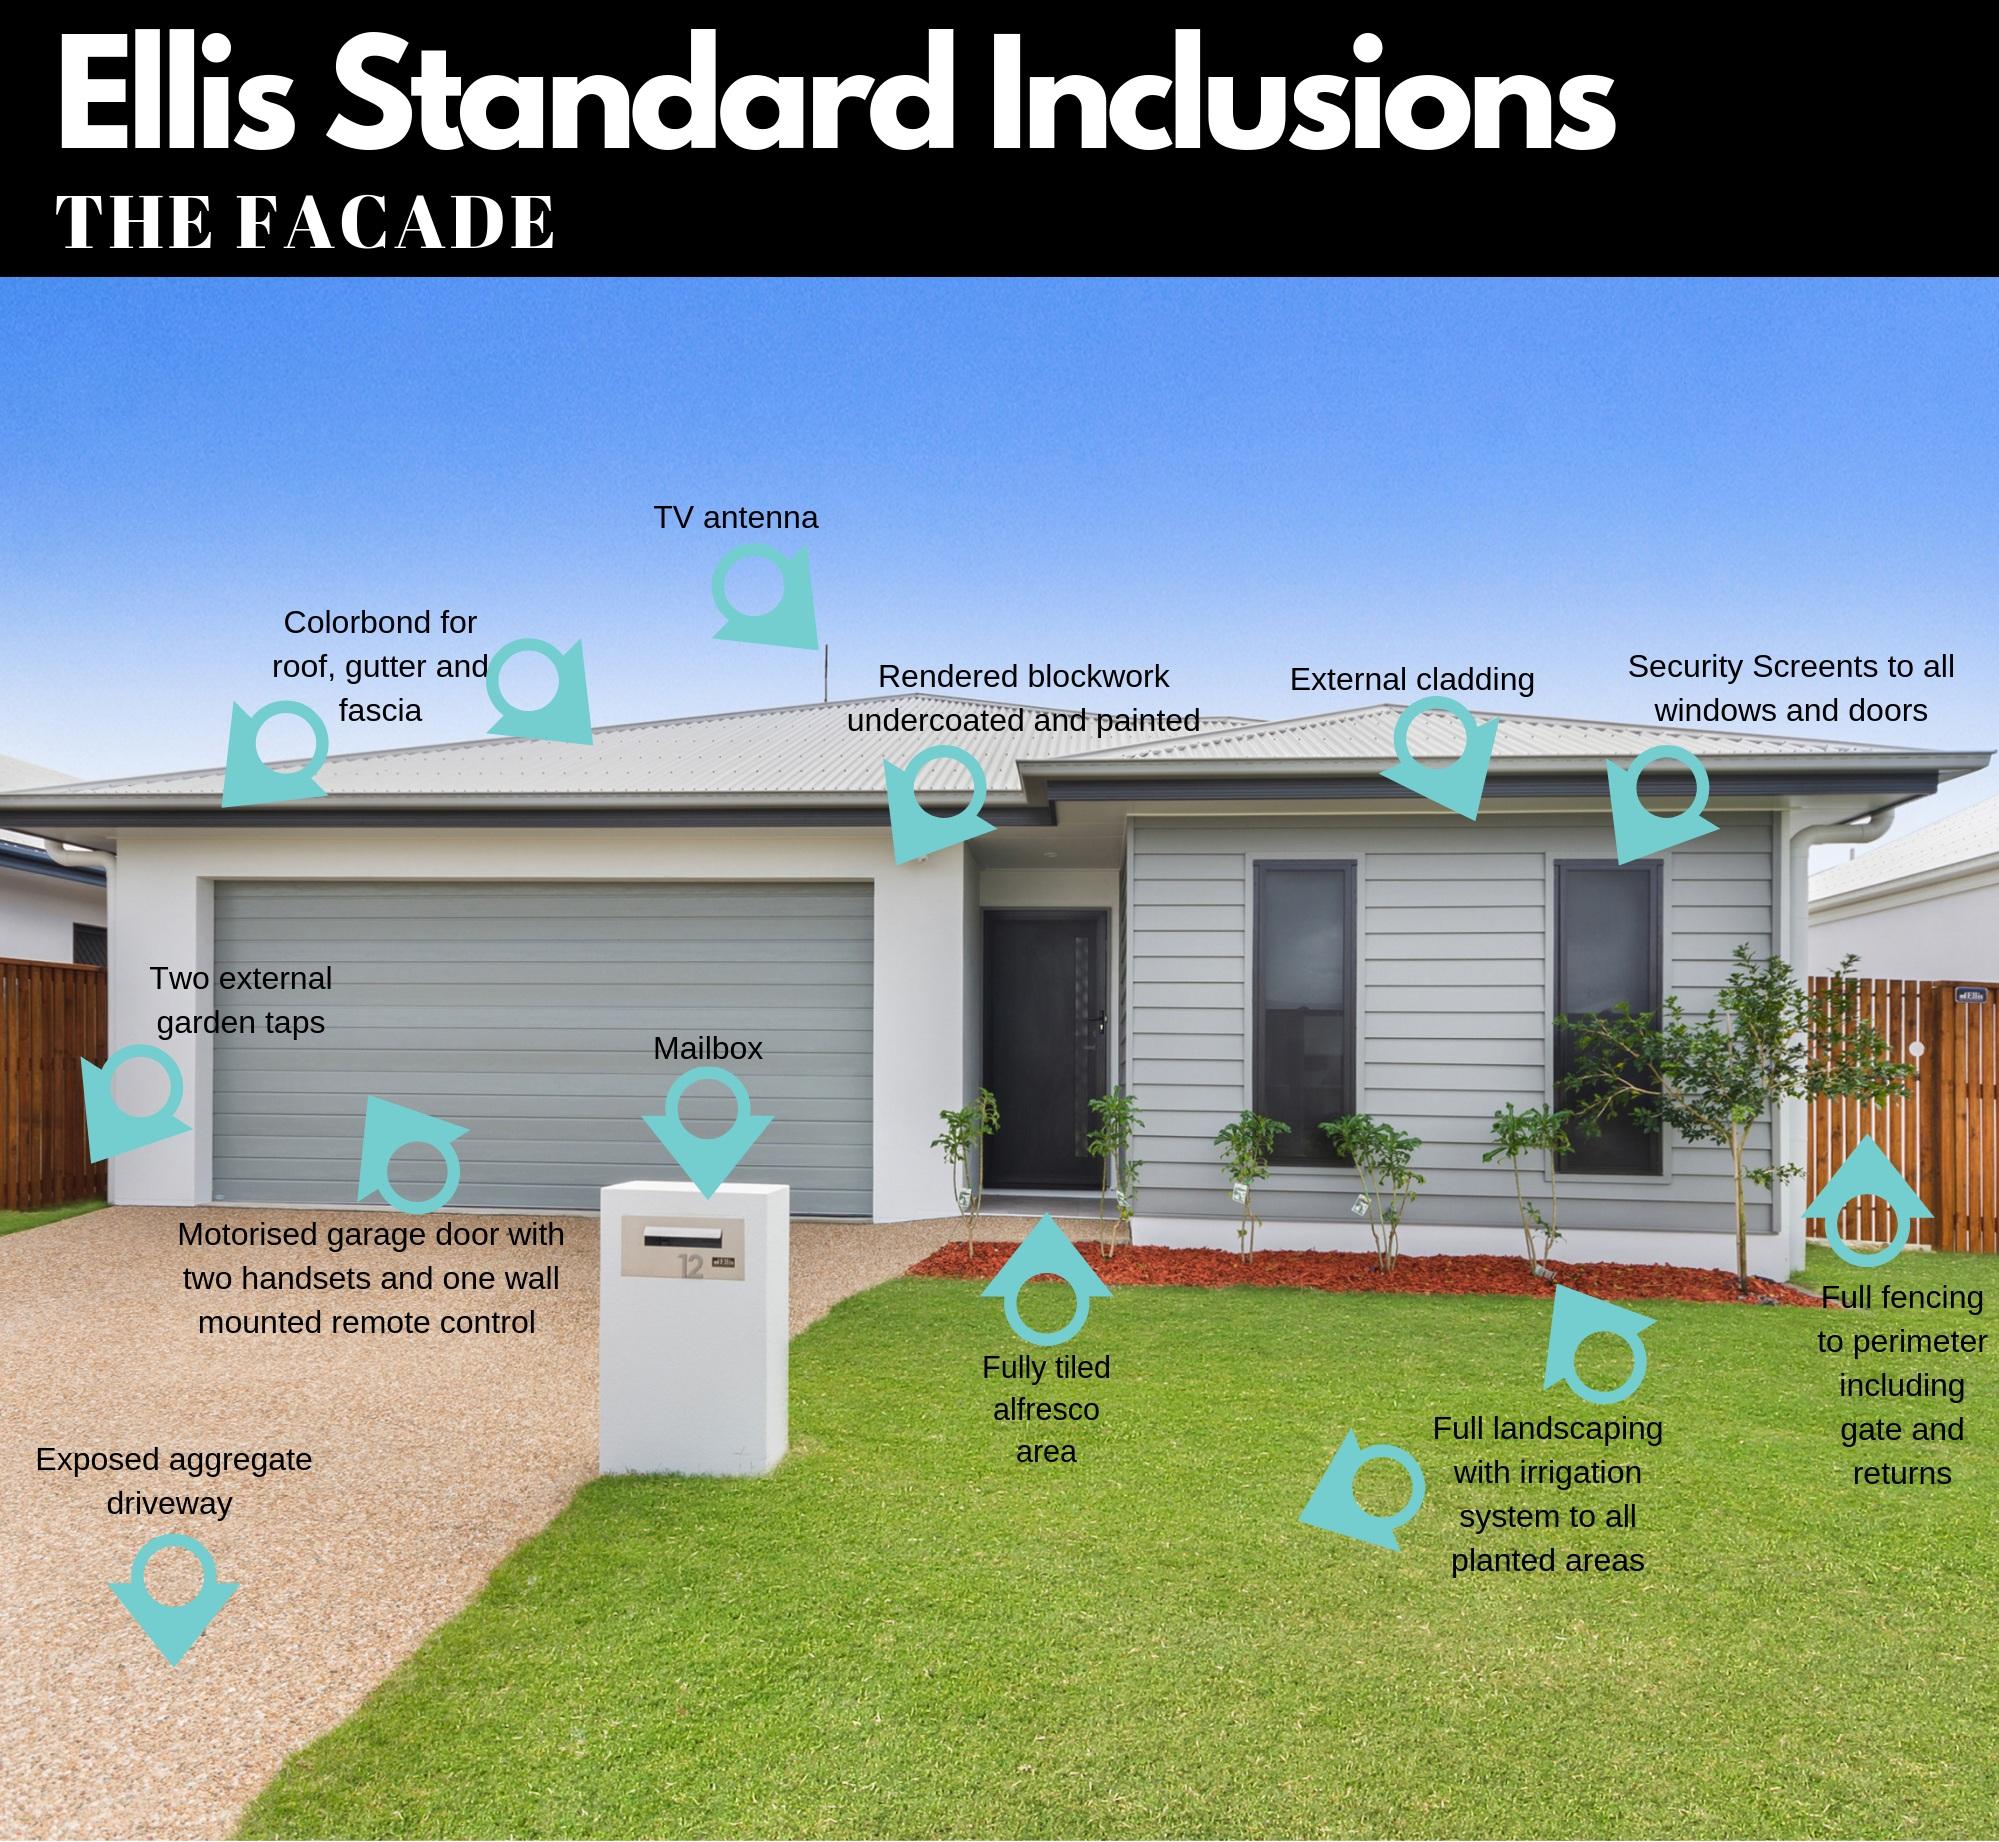 EllisDevelopments_StandardInclusions_Facades.png.jpg